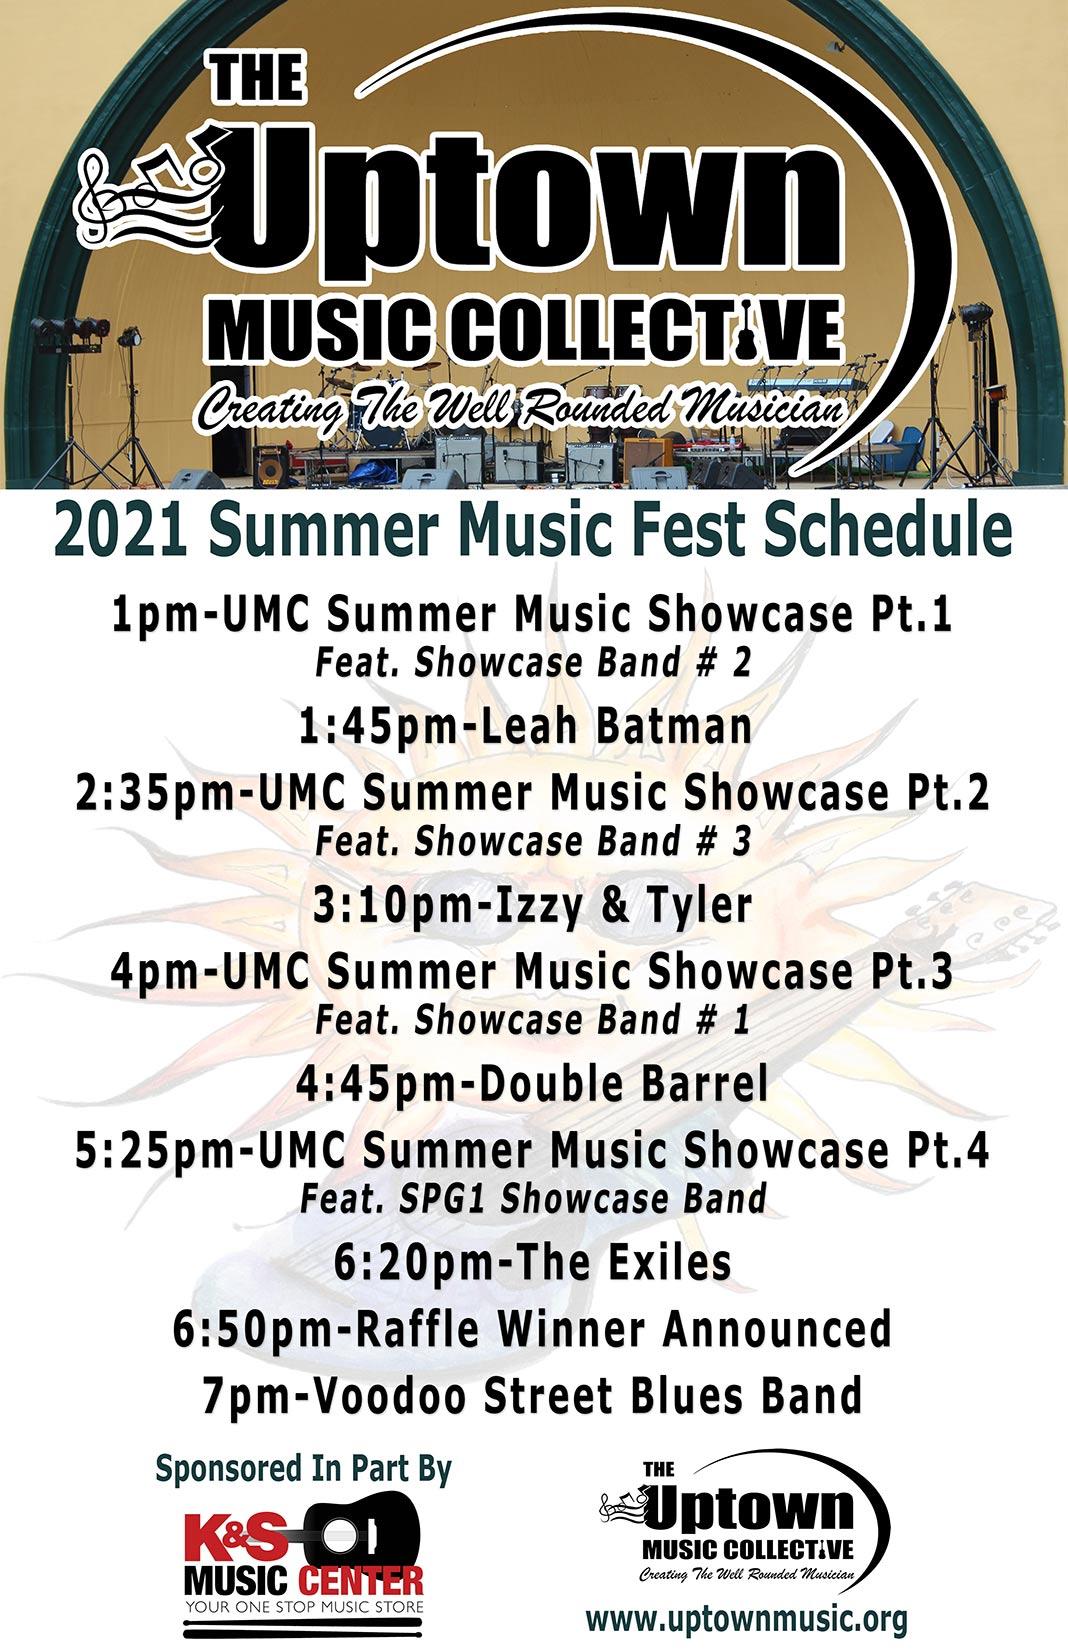 Summer Music Festival 2021 Schedule